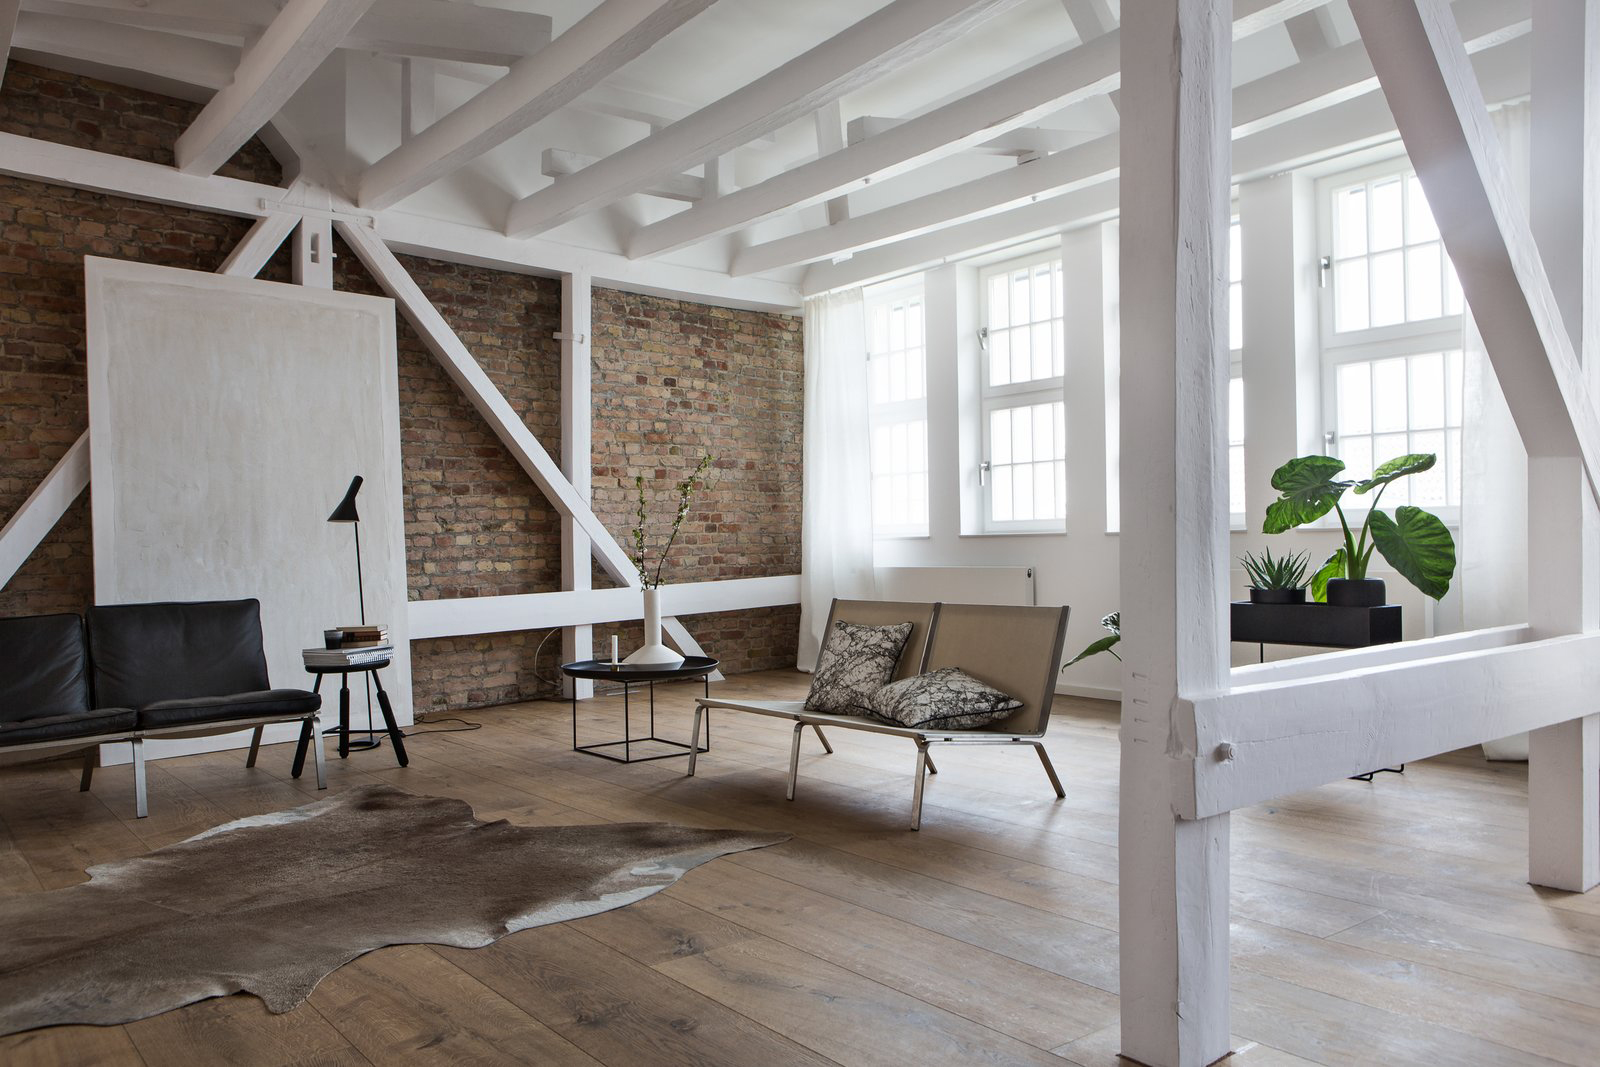 Berlin loft for sale via Fantastic Frank